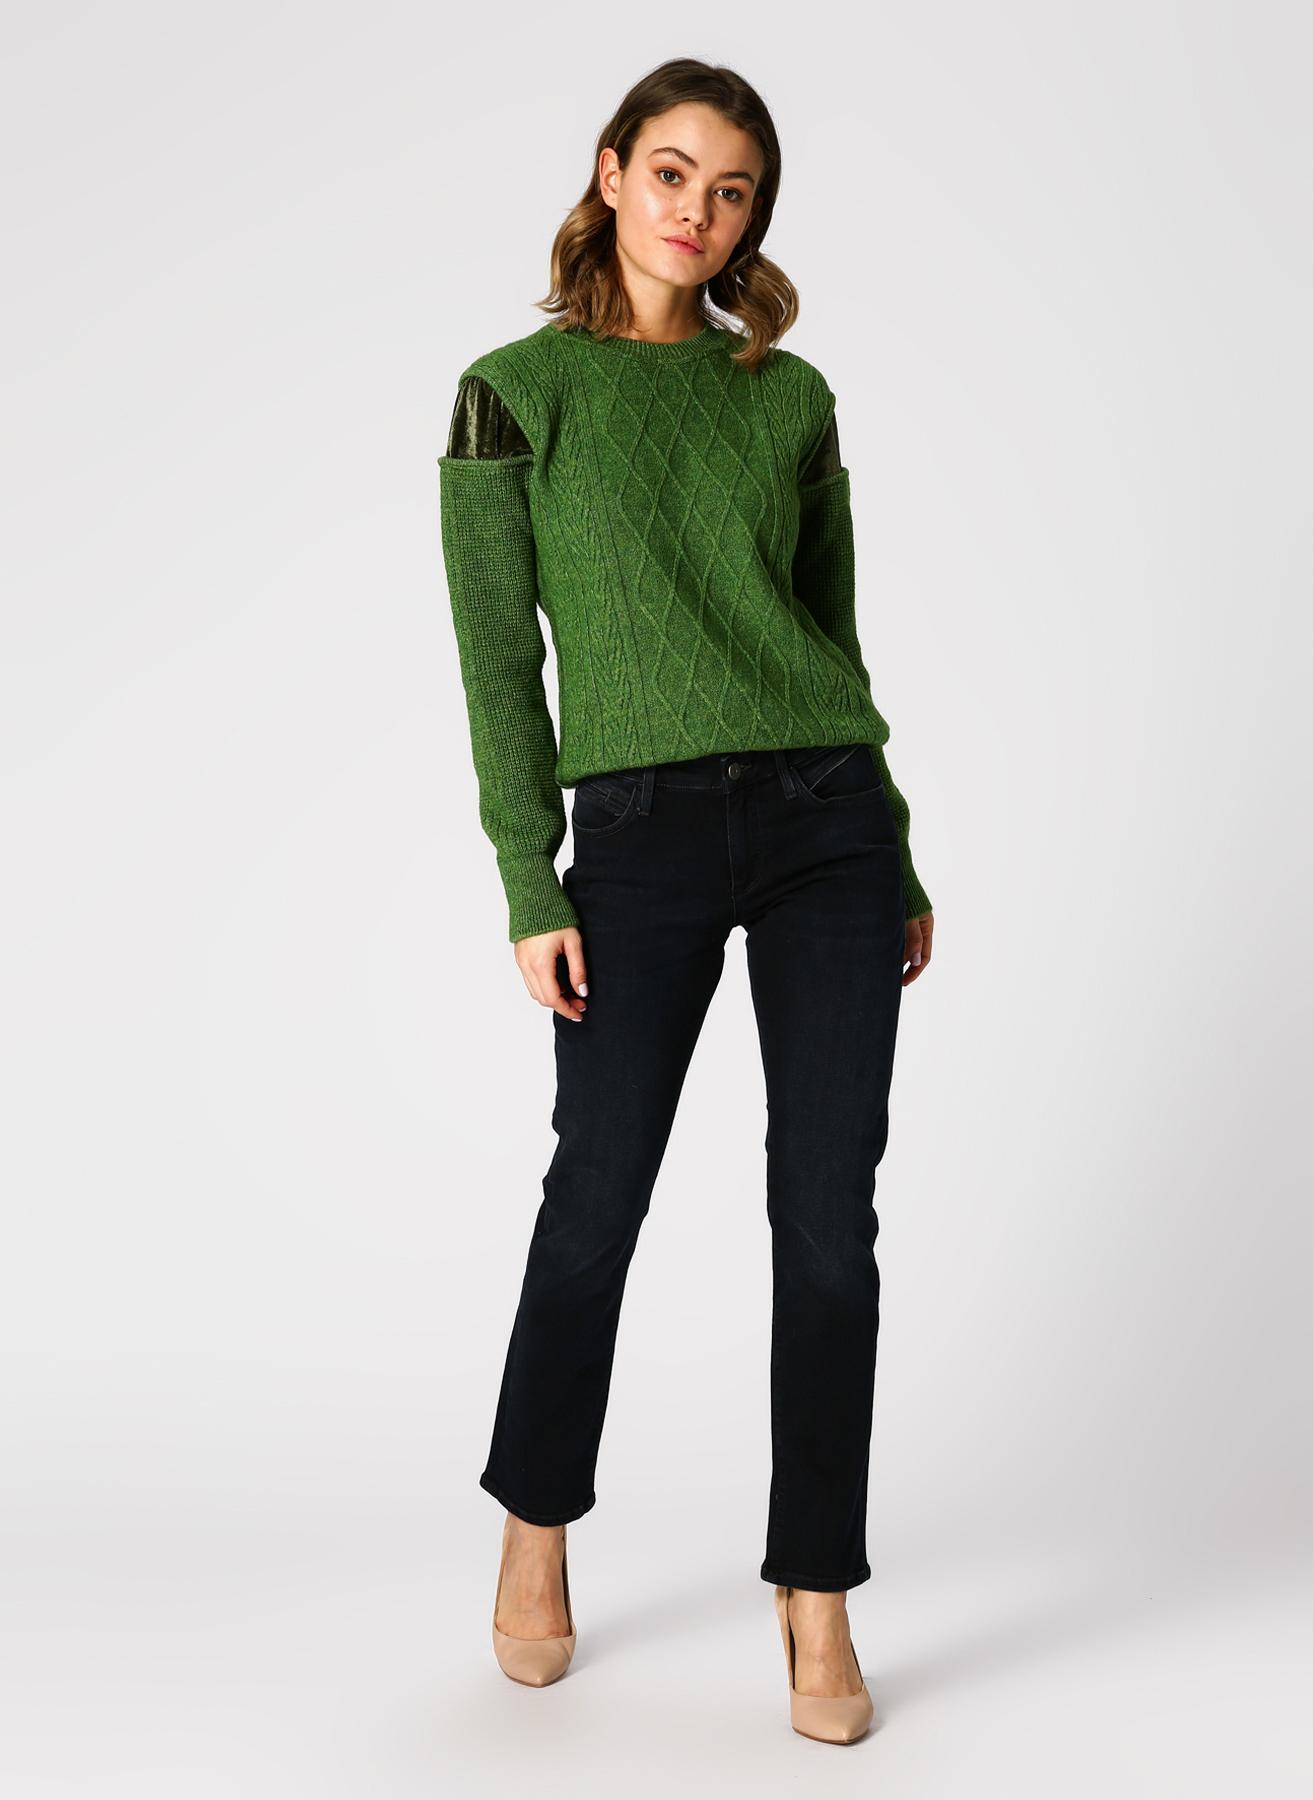 Mavi Straight Lacivert Denim Pantolon 30-32 5001634319012 Ürün Resmi